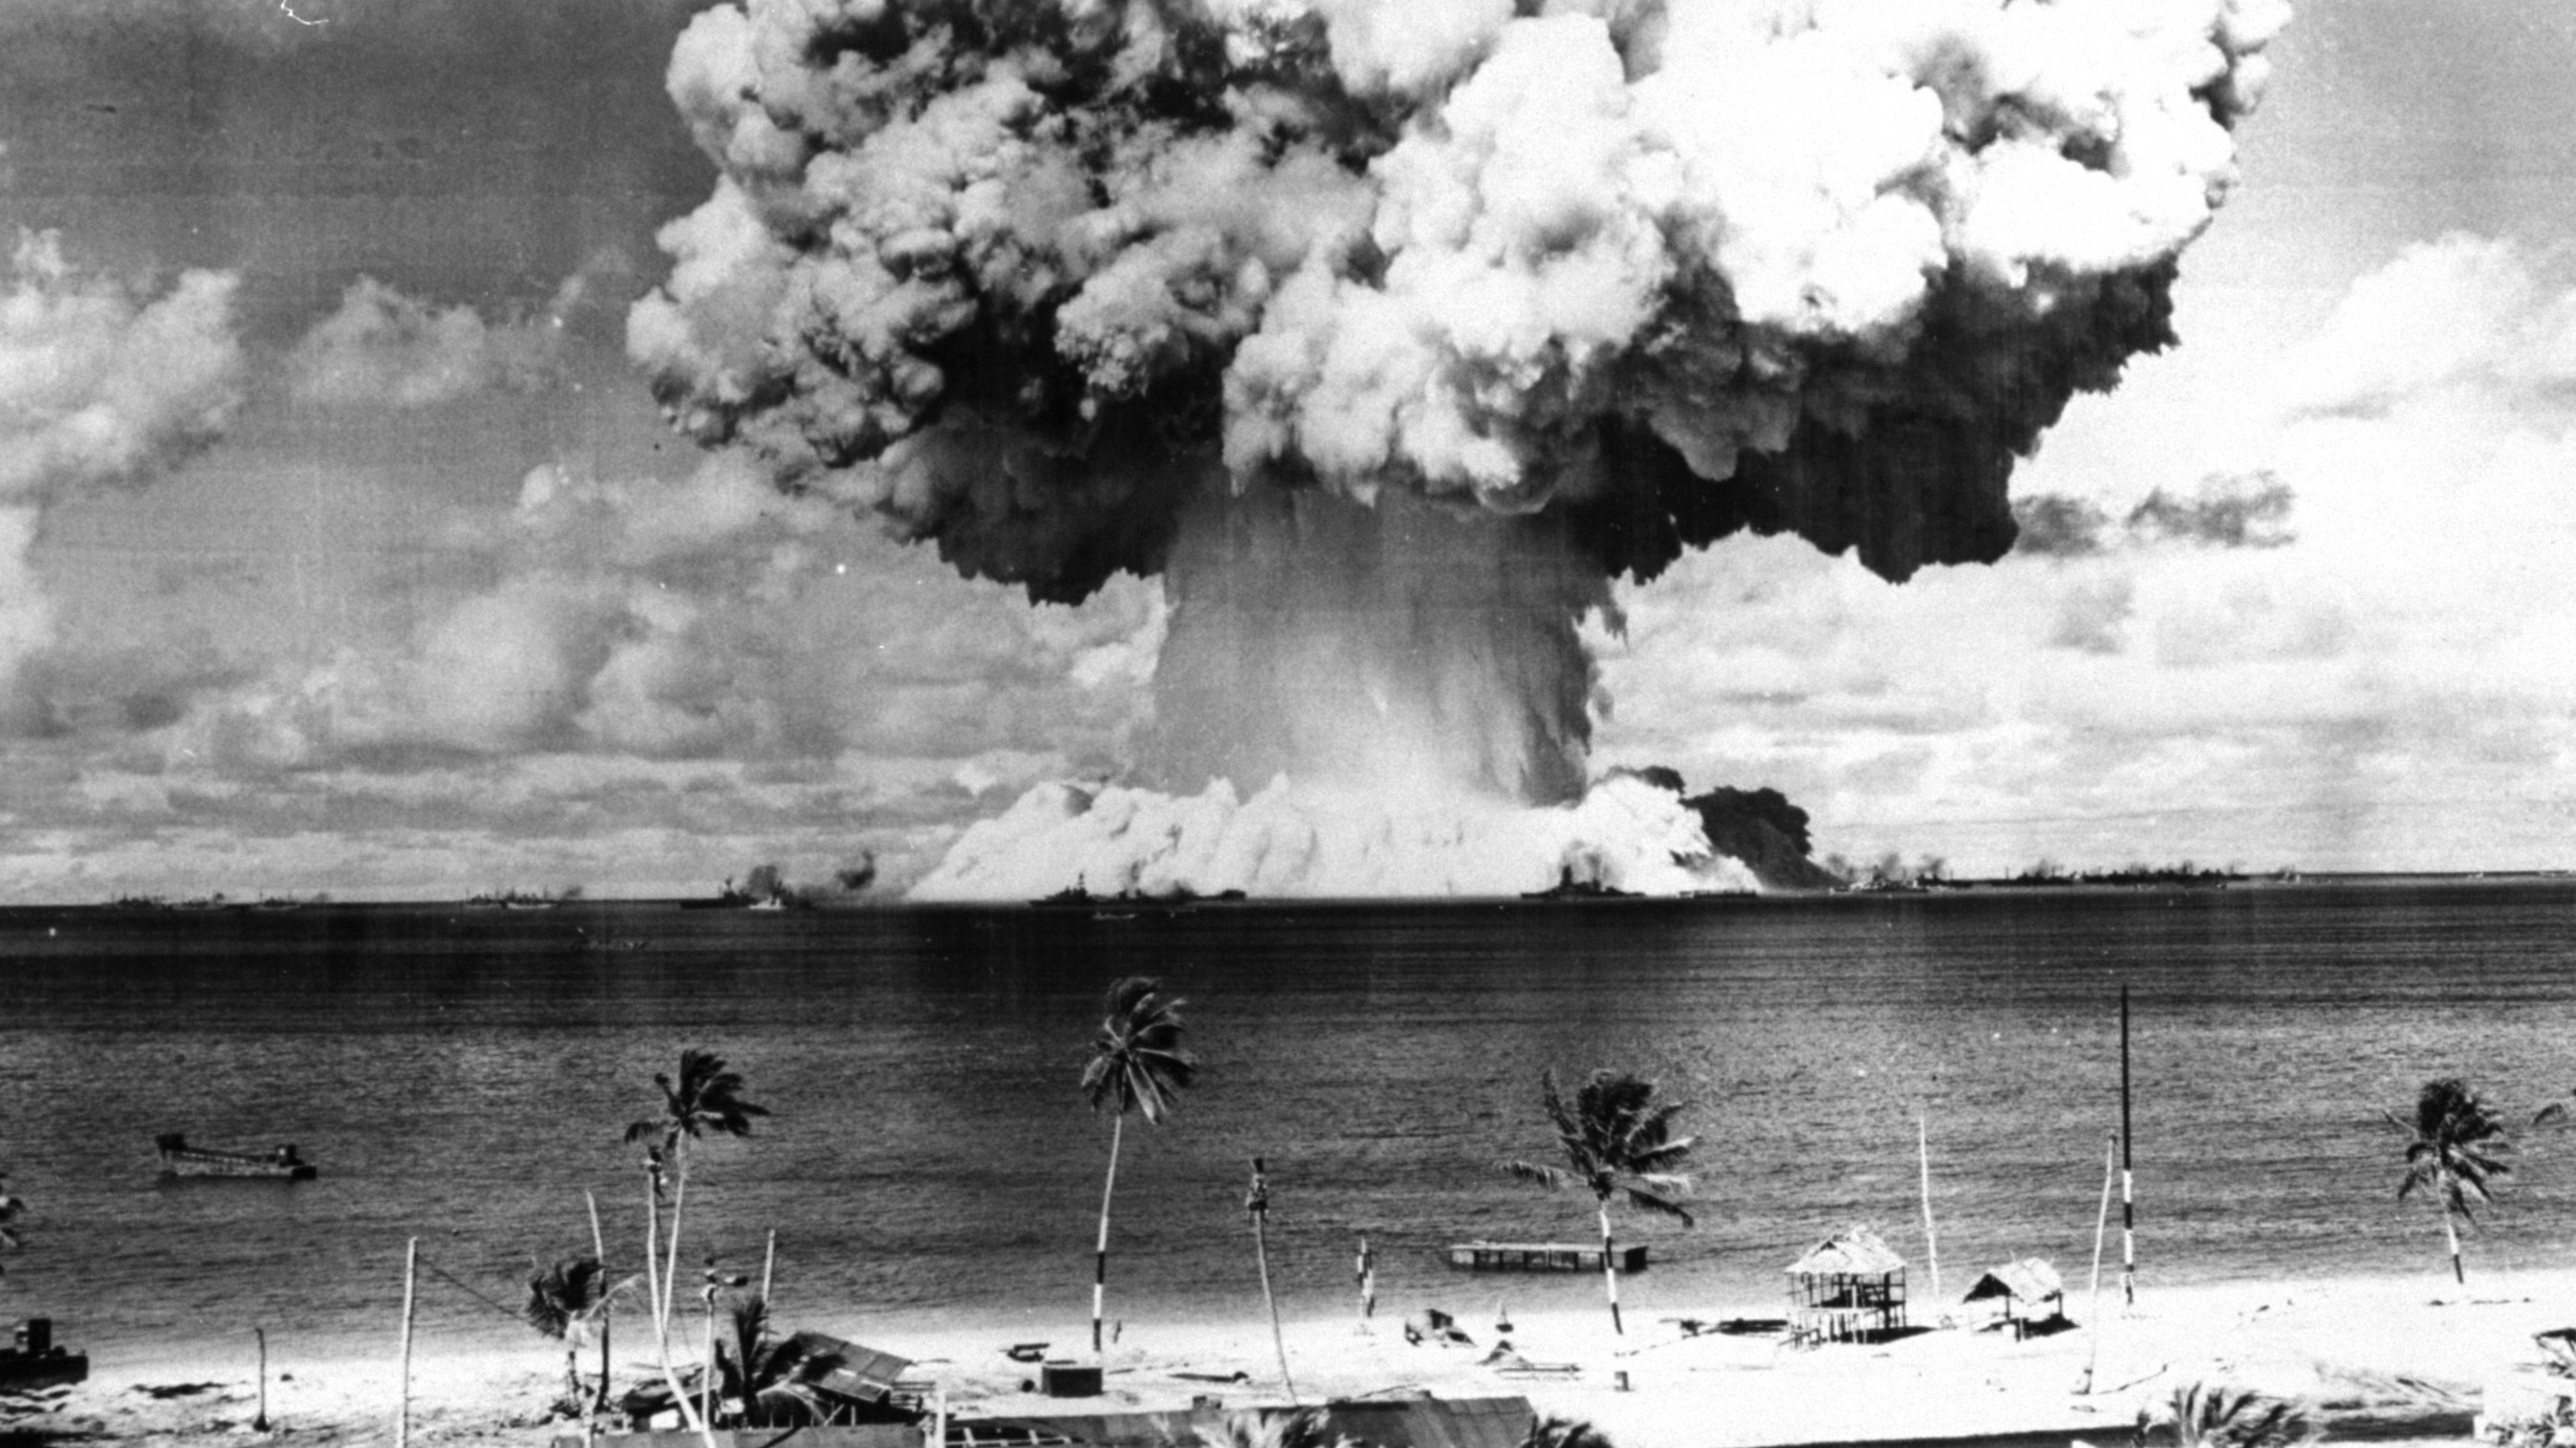 Can not Bikini atoll nuclear tests think